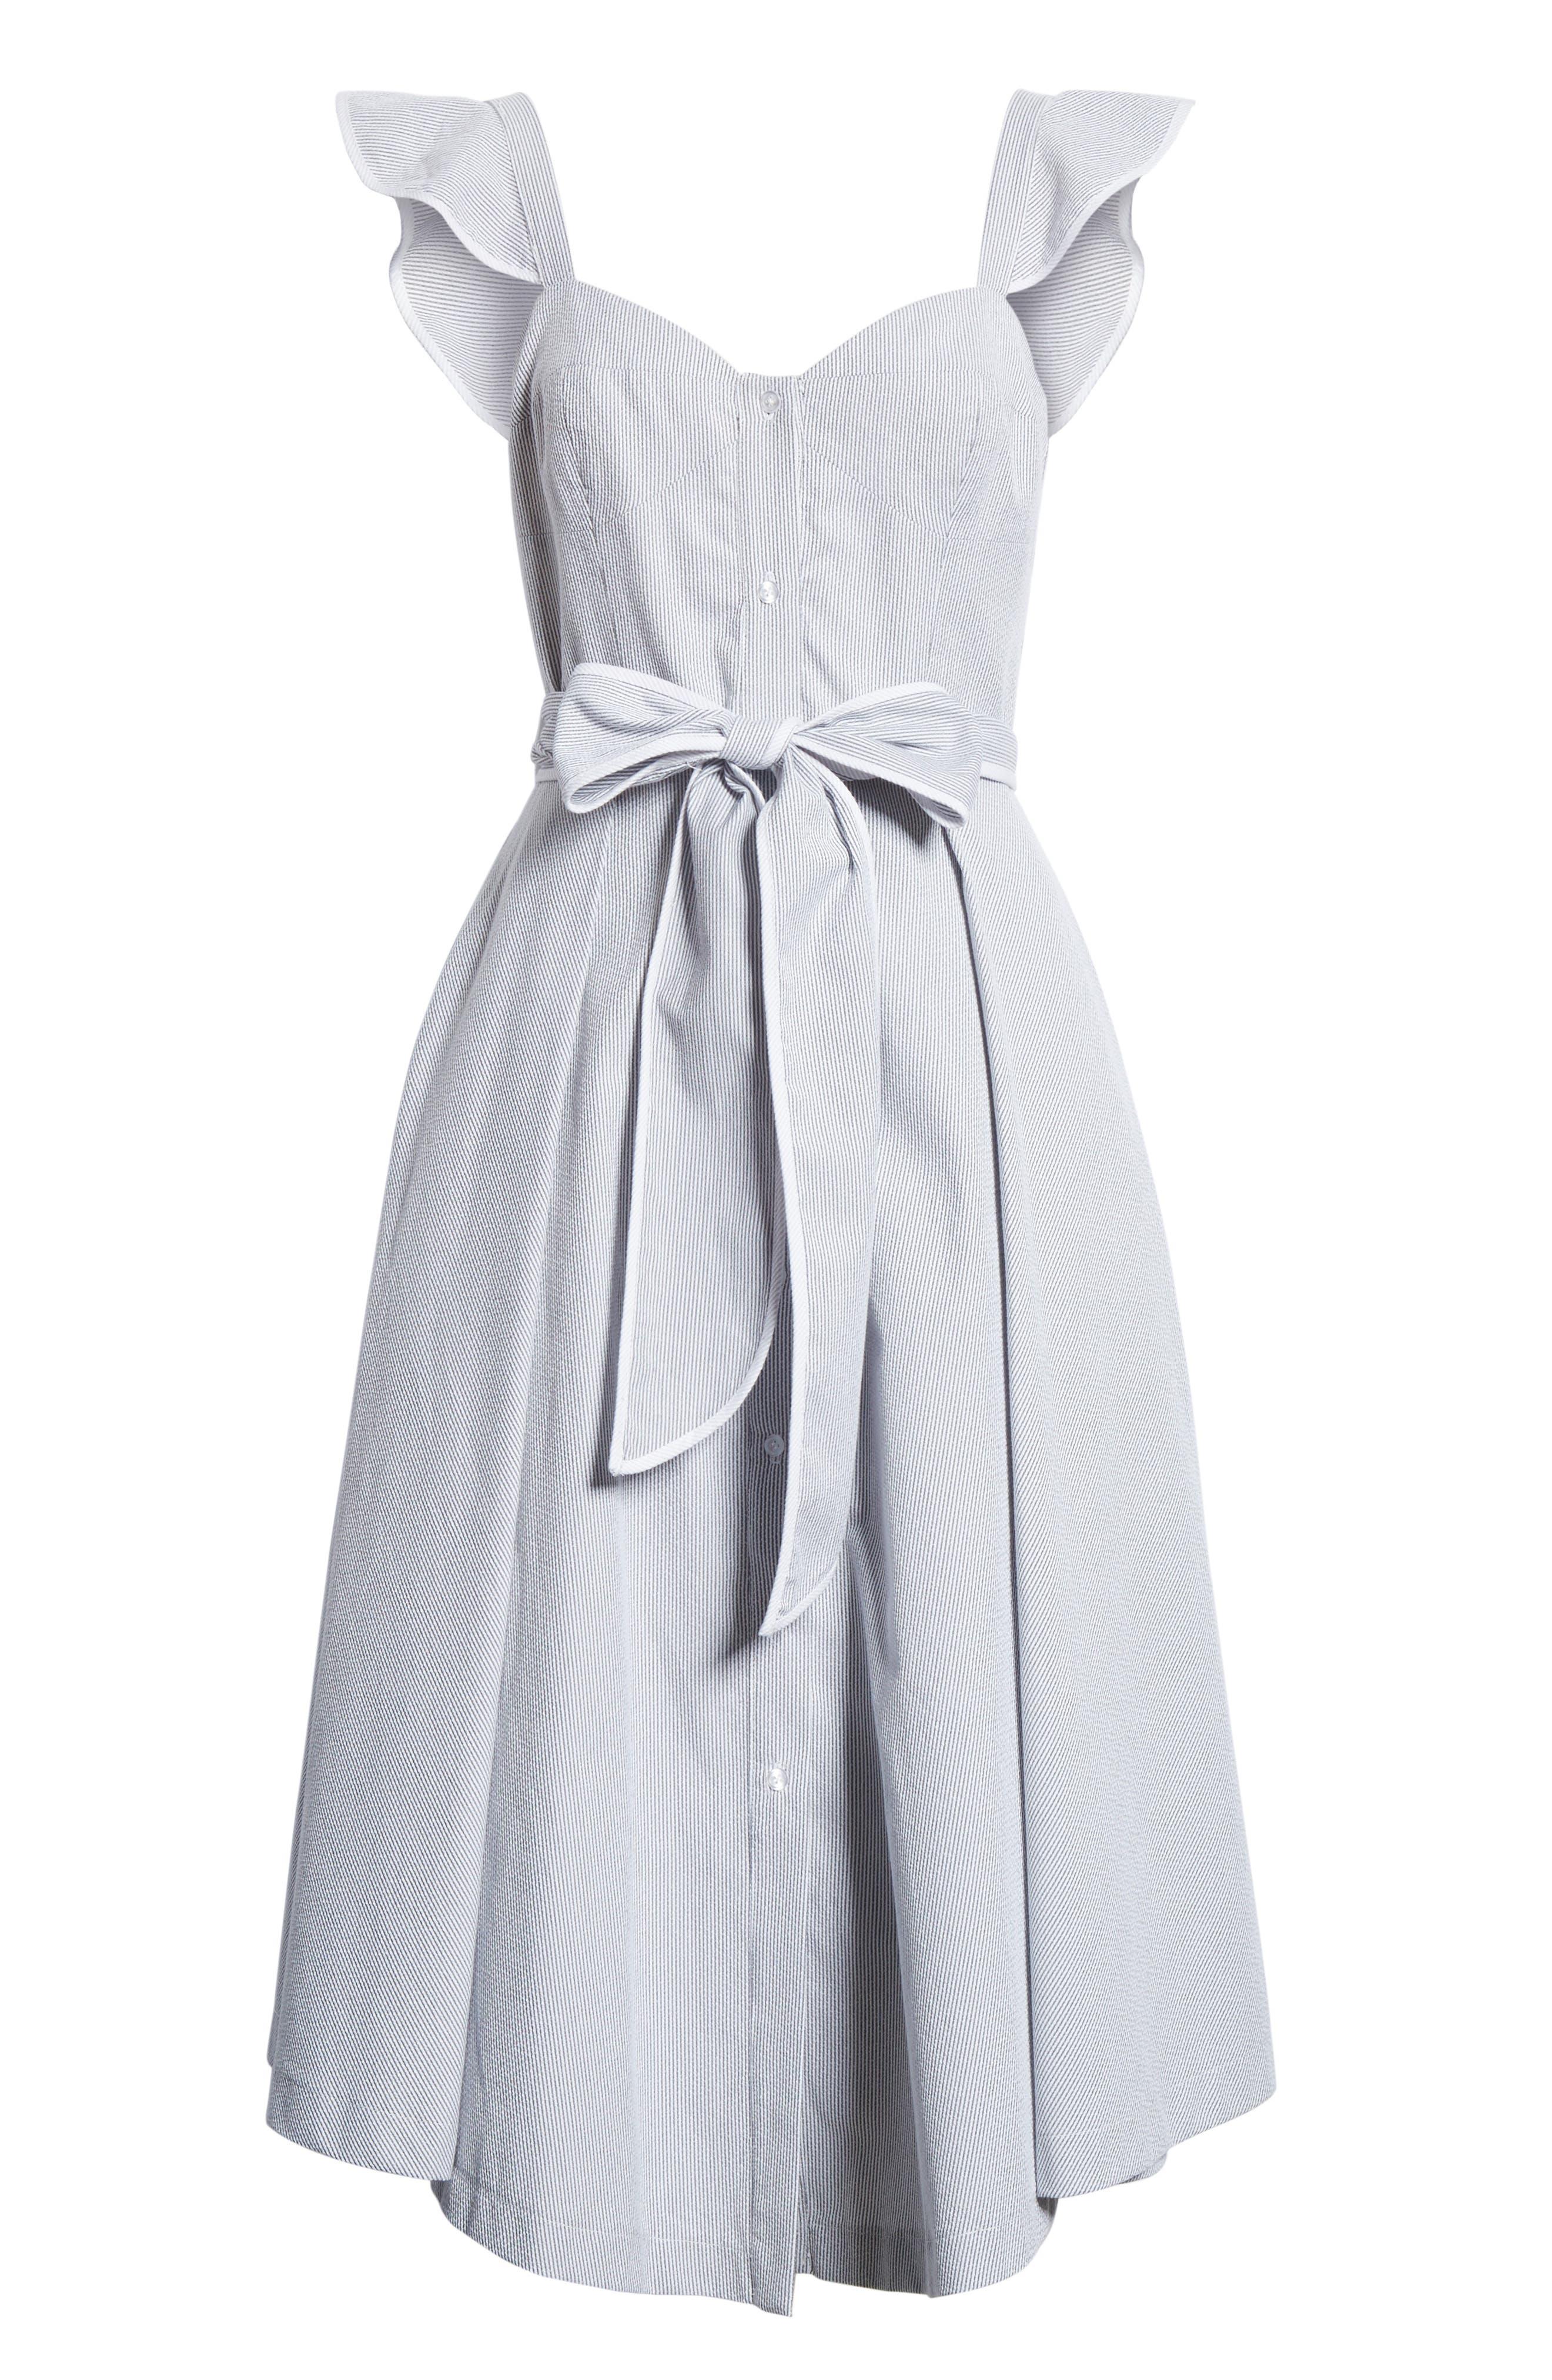 Ruffle Seersucker A-Line Dress,                             Alternate thumbnail 6, color,                             001